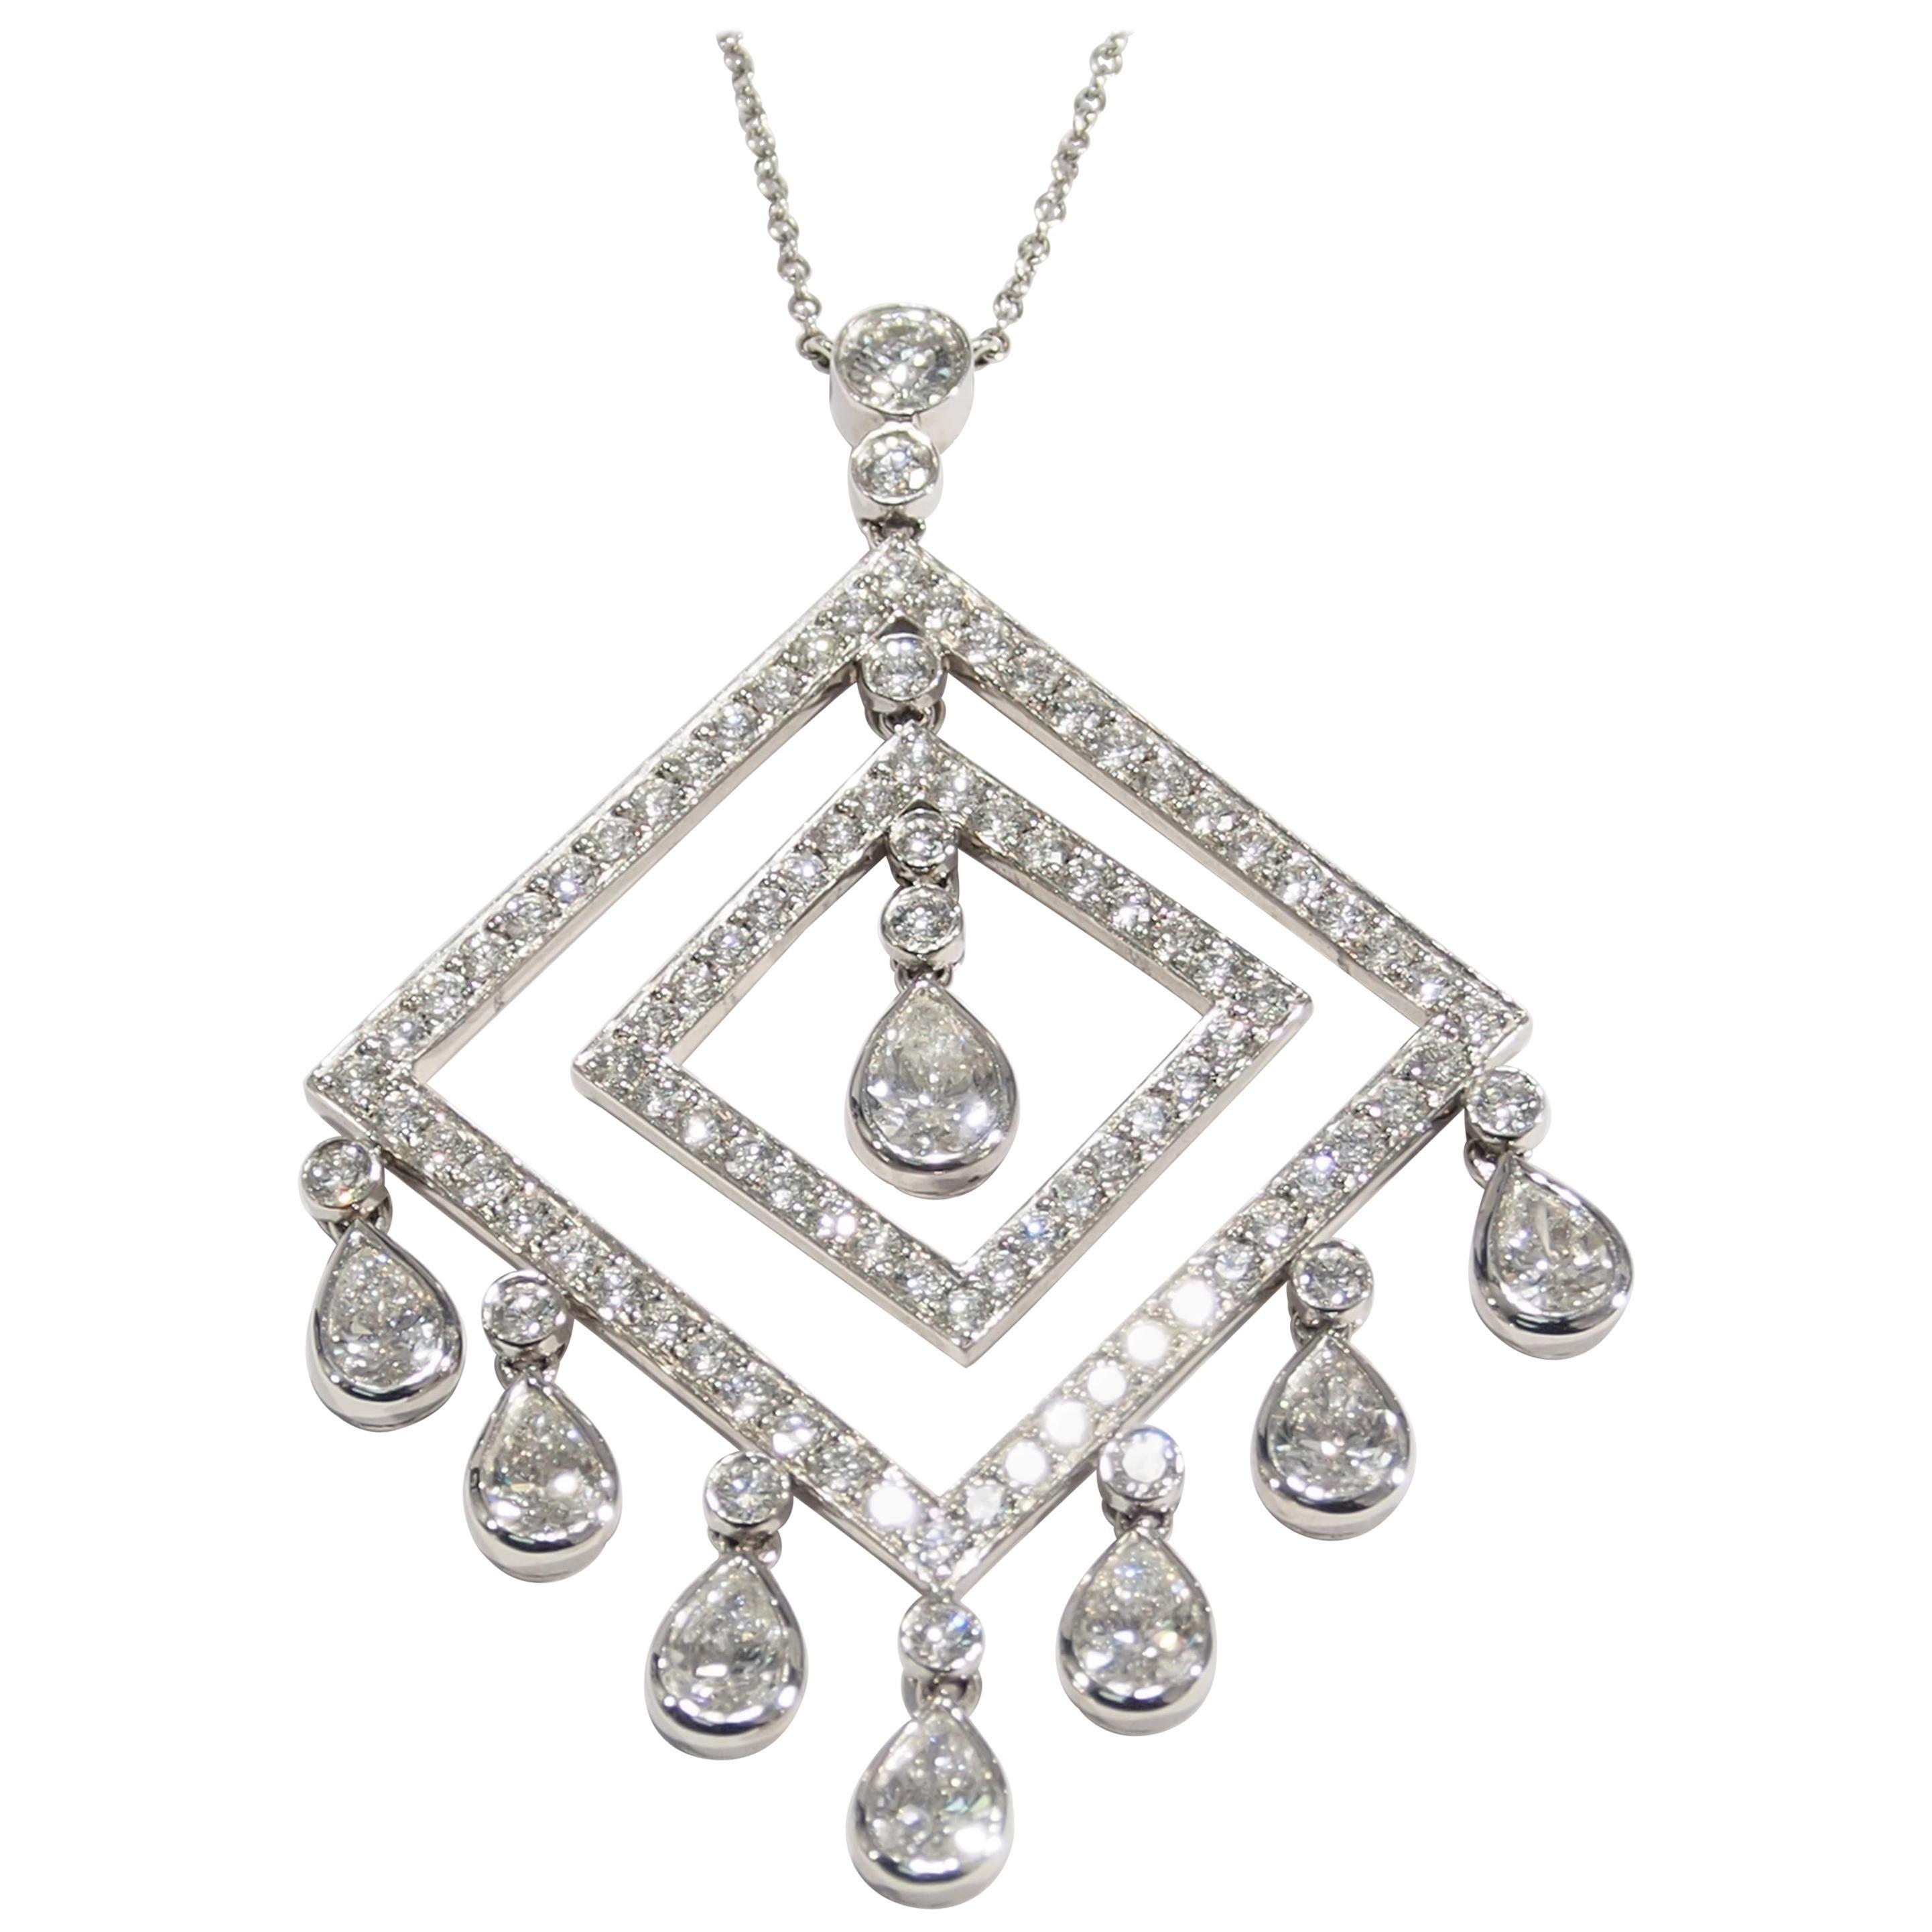 0dd2c5f91a61b Platinum Tiffany & Co. Diamond Necklace Pendant White Large 5.00 Carat